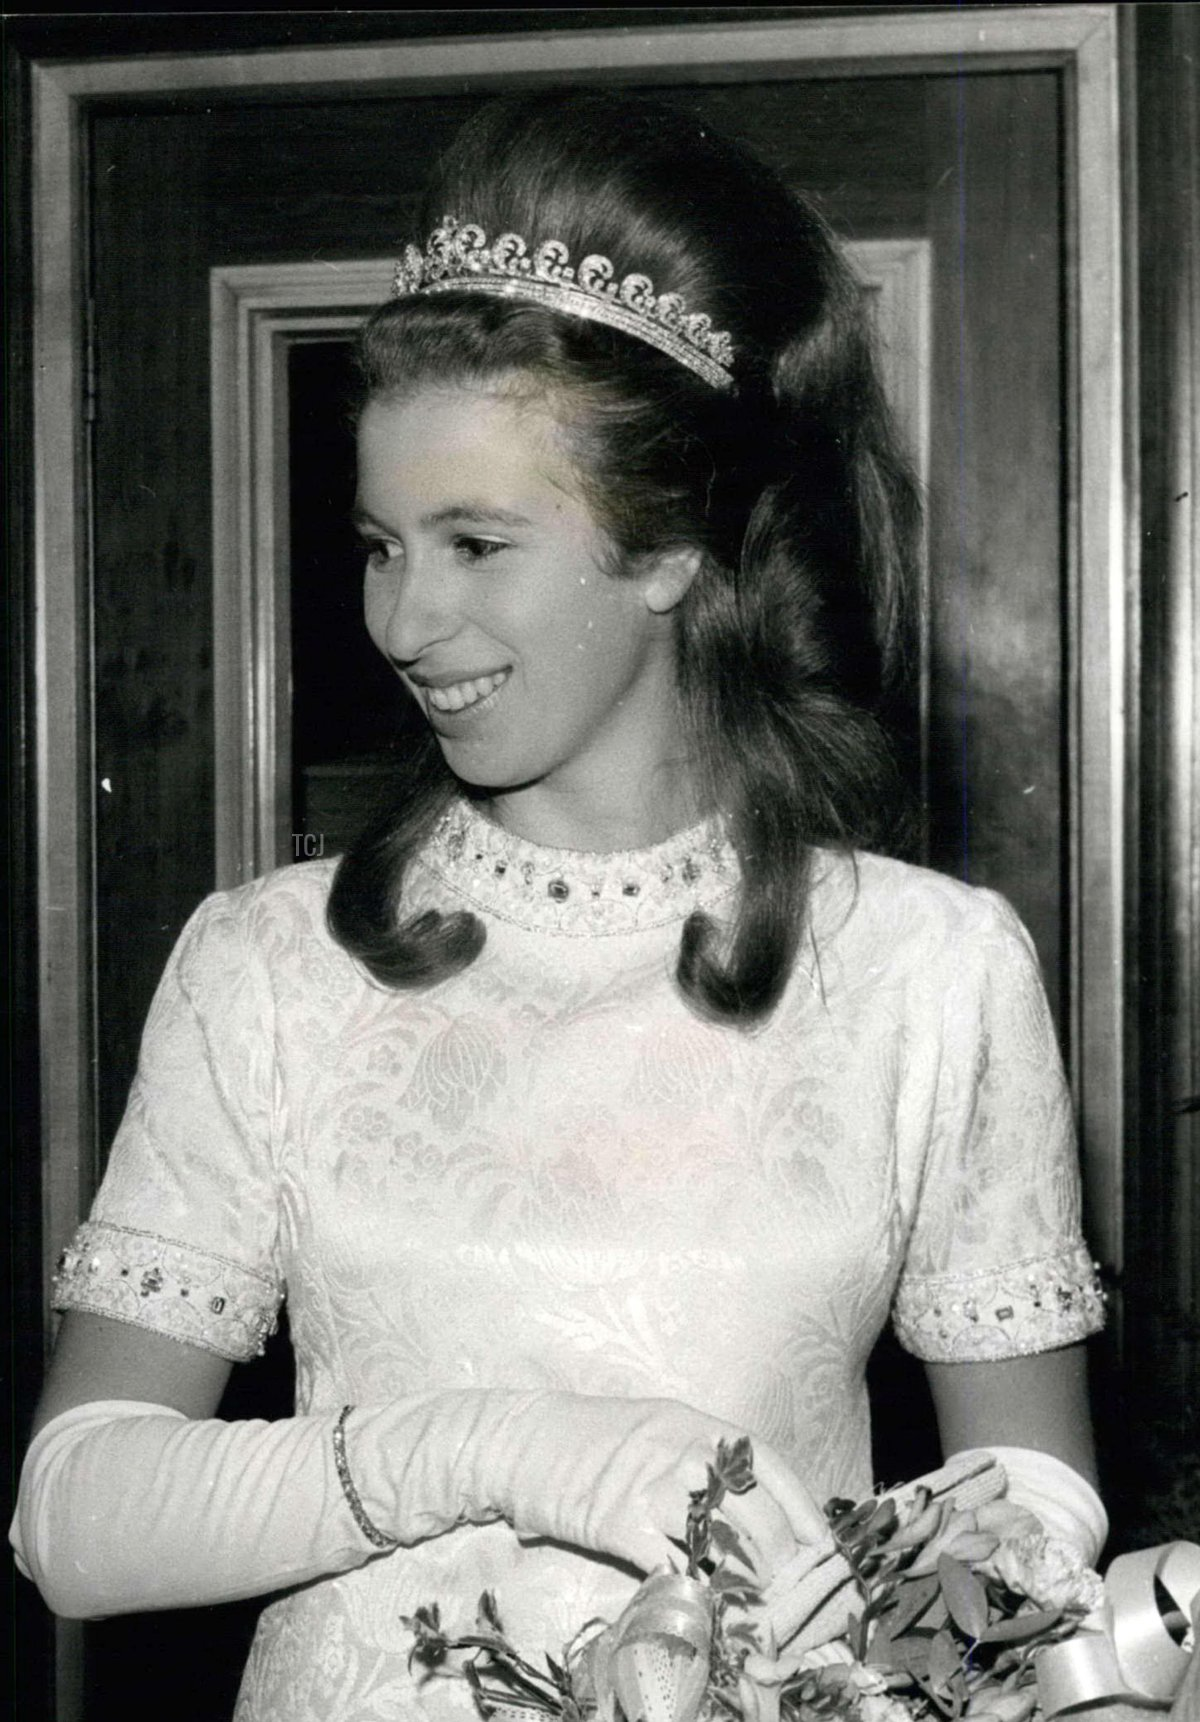 Princess Anne attends a film premiere at the Warner Theatre, November 1969